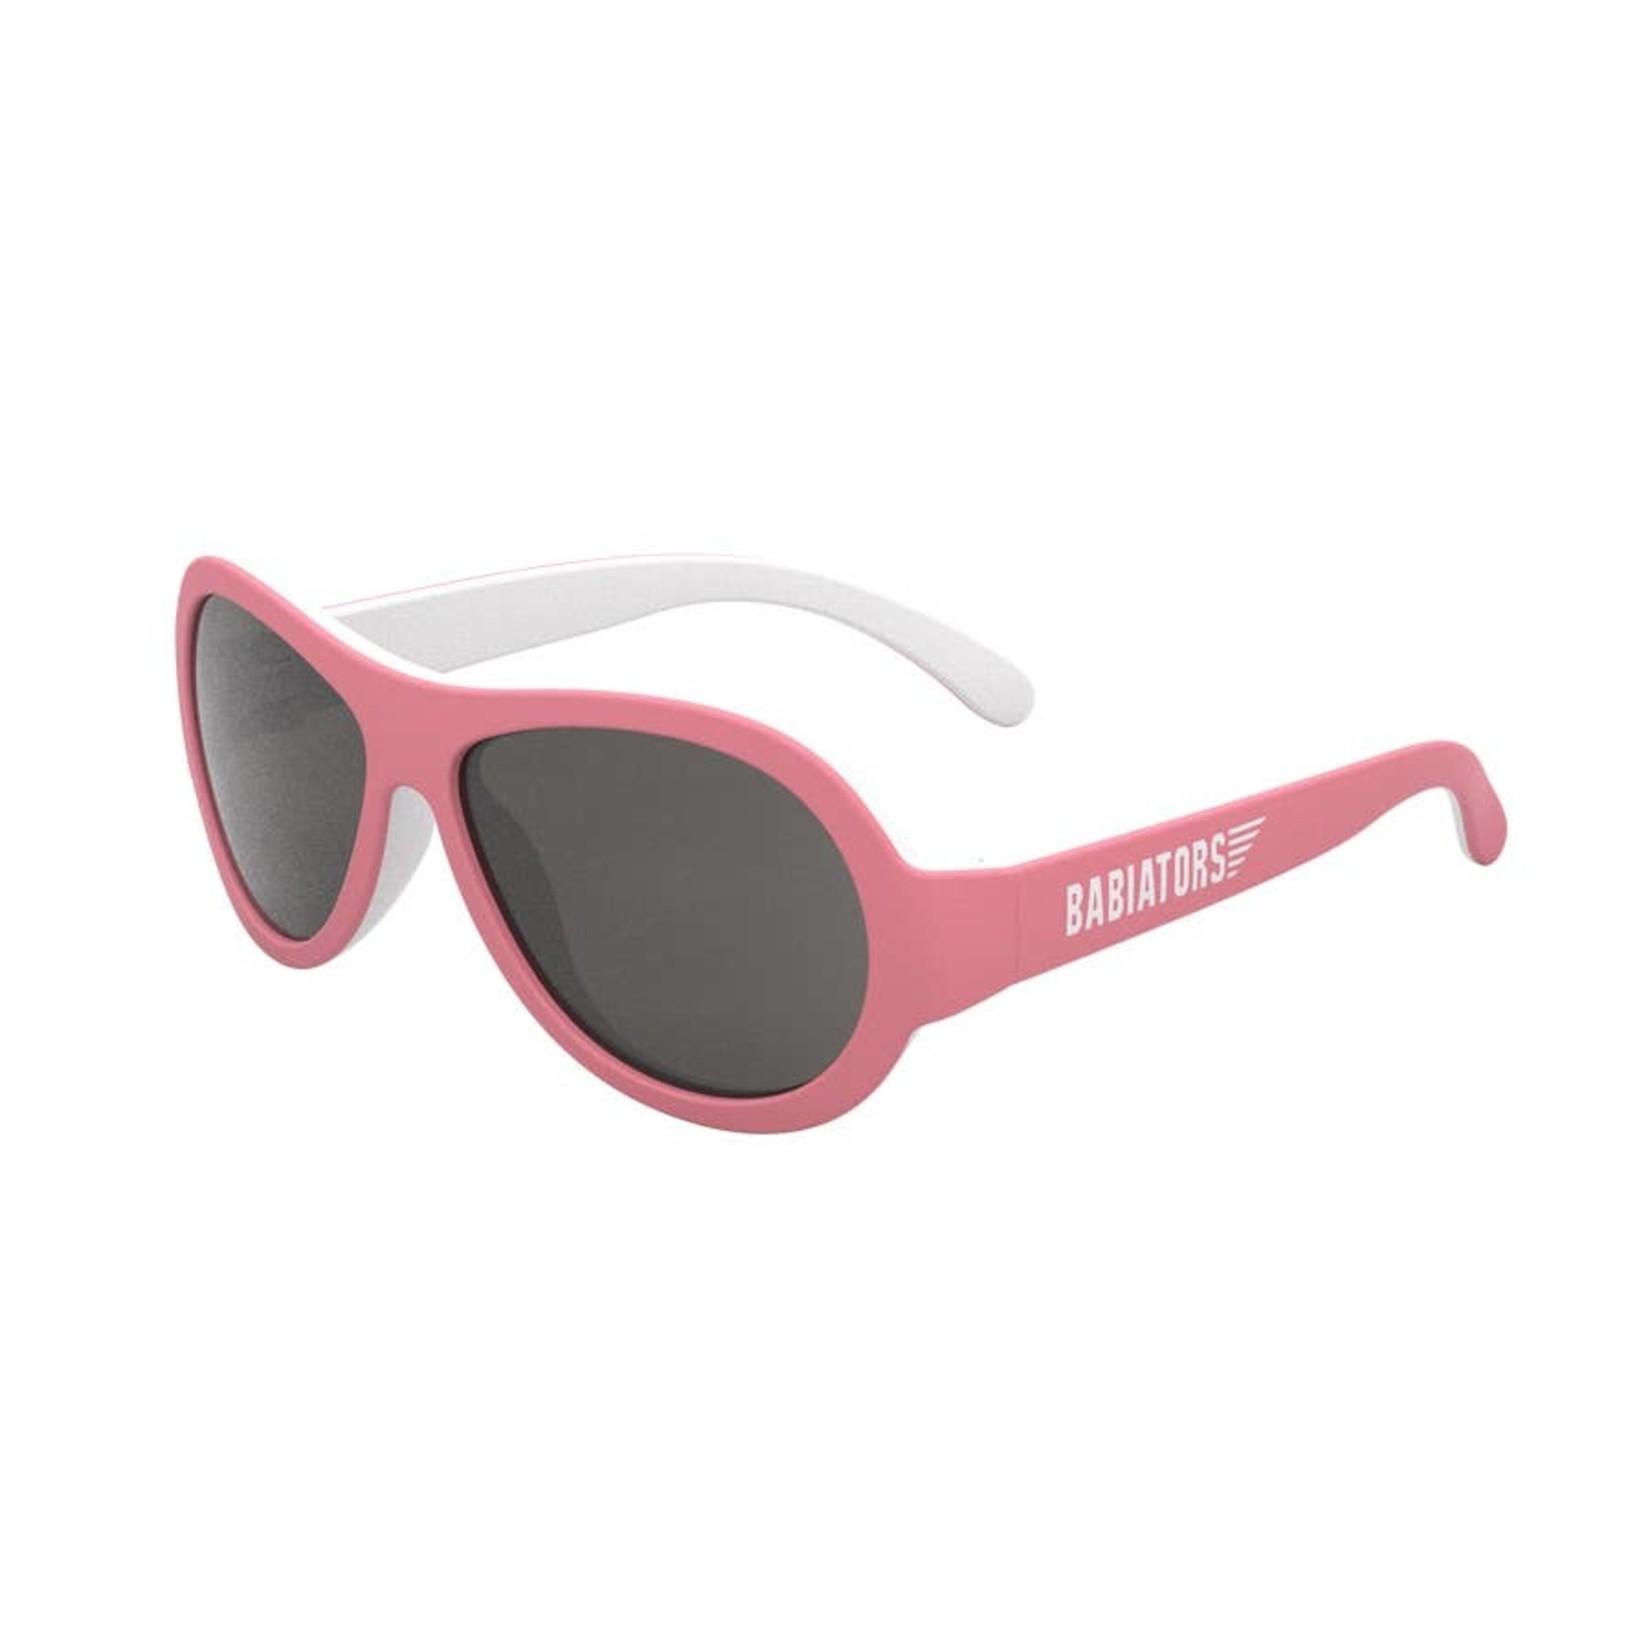 Babiators Sunglasses - Two Toned Aviators - Tickled Pink  (0-2Y)